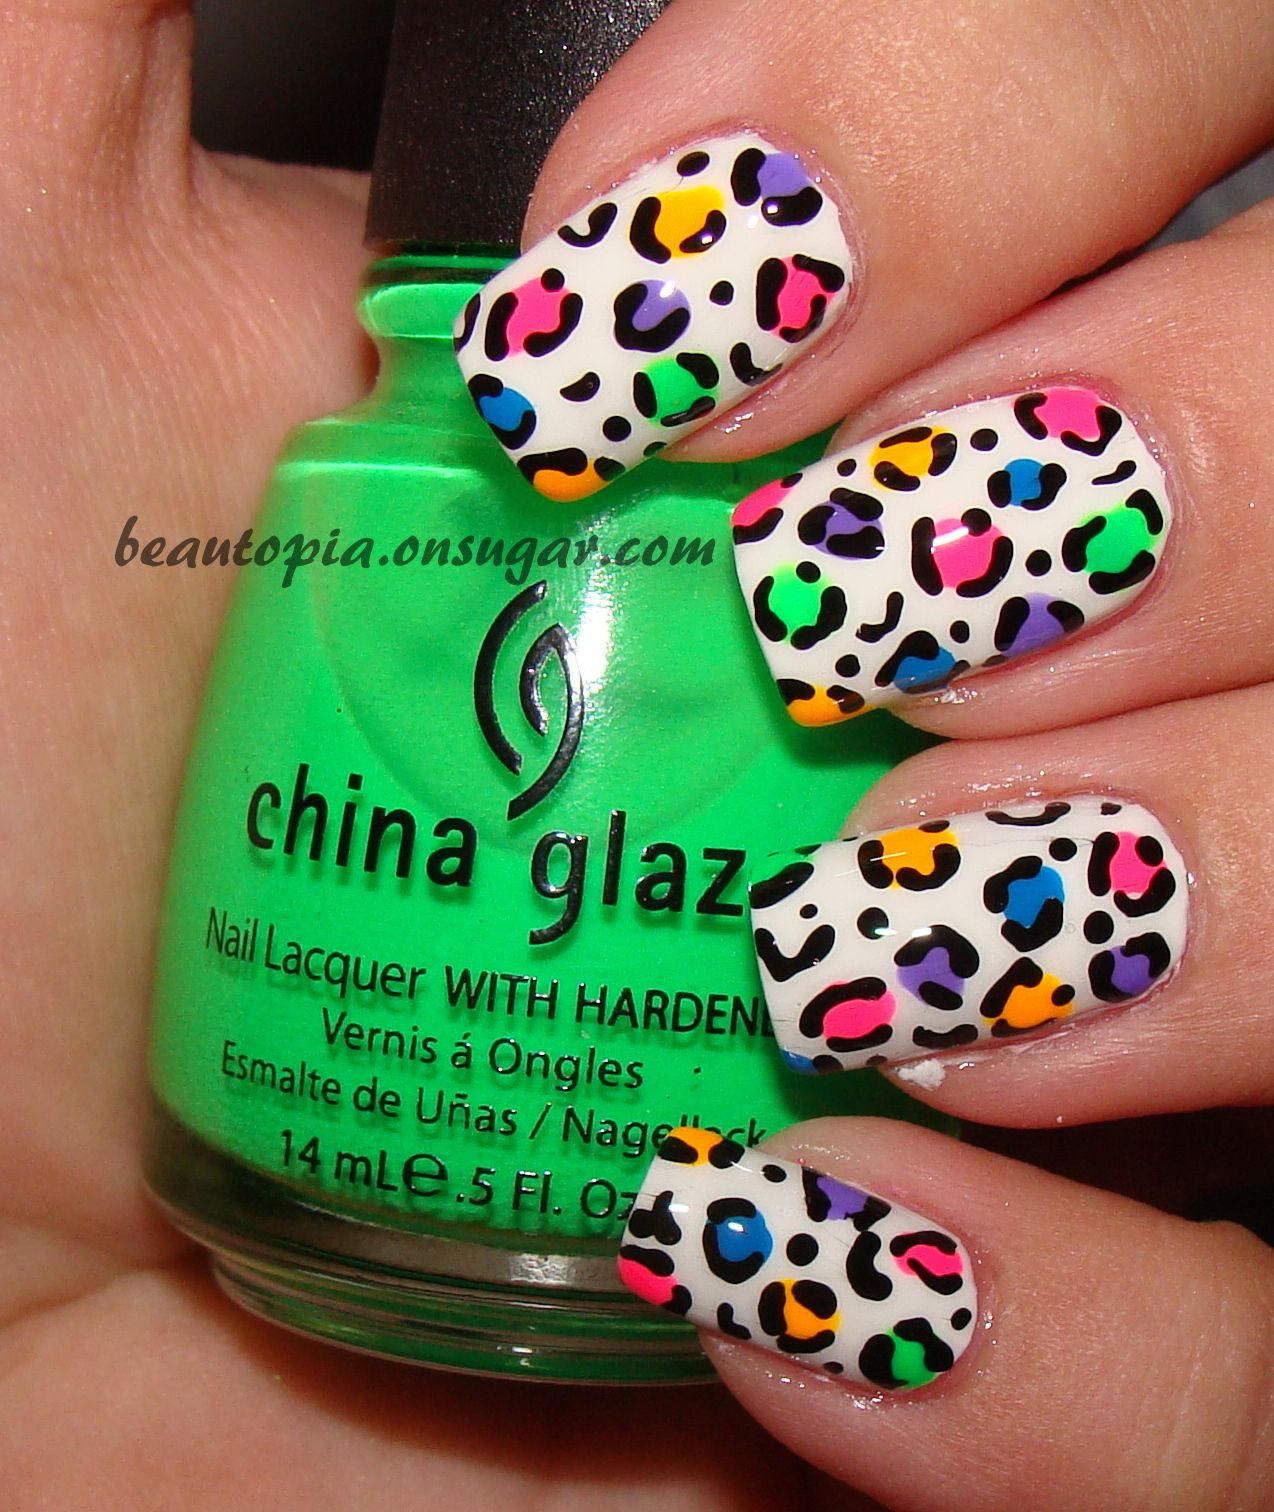 Vistoso Las Uñas De Leopardo Rosa Ornamento - Ideas de Pintar de ...